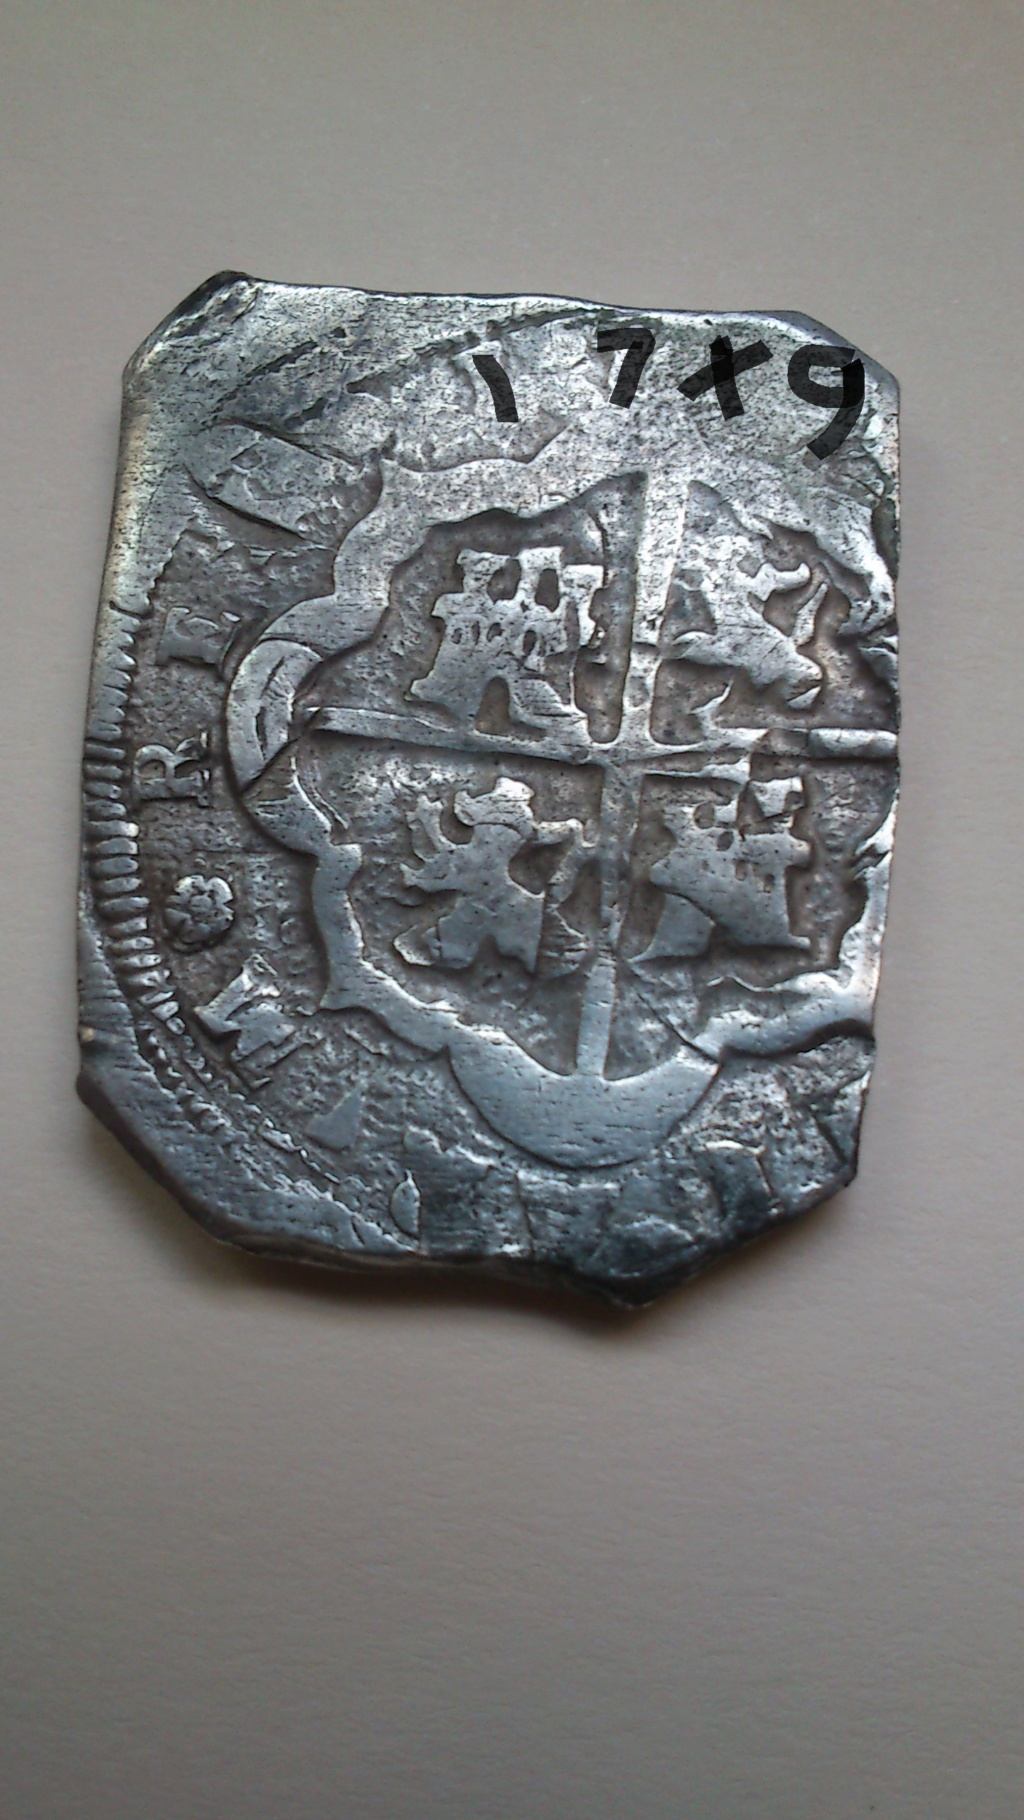 8 REALES FELIPE V 1709 CECA DE MADRID (tipo macuquina) Dsc_0049